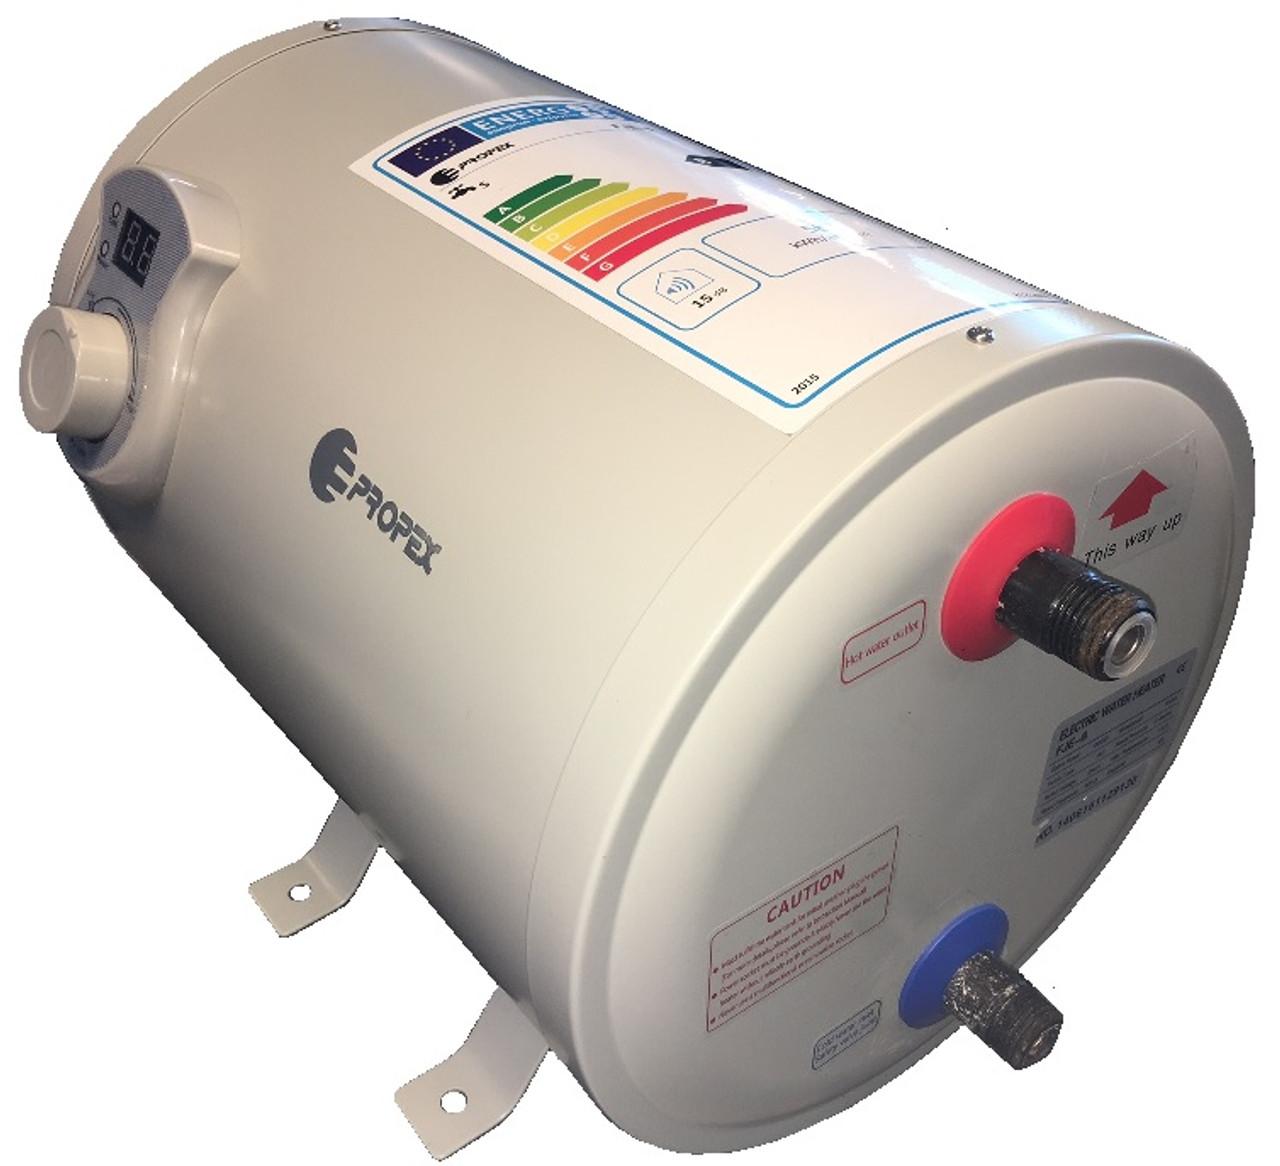 Propex Motorhome & Caravan Mains Electric Water Storage Heater 6 Litre